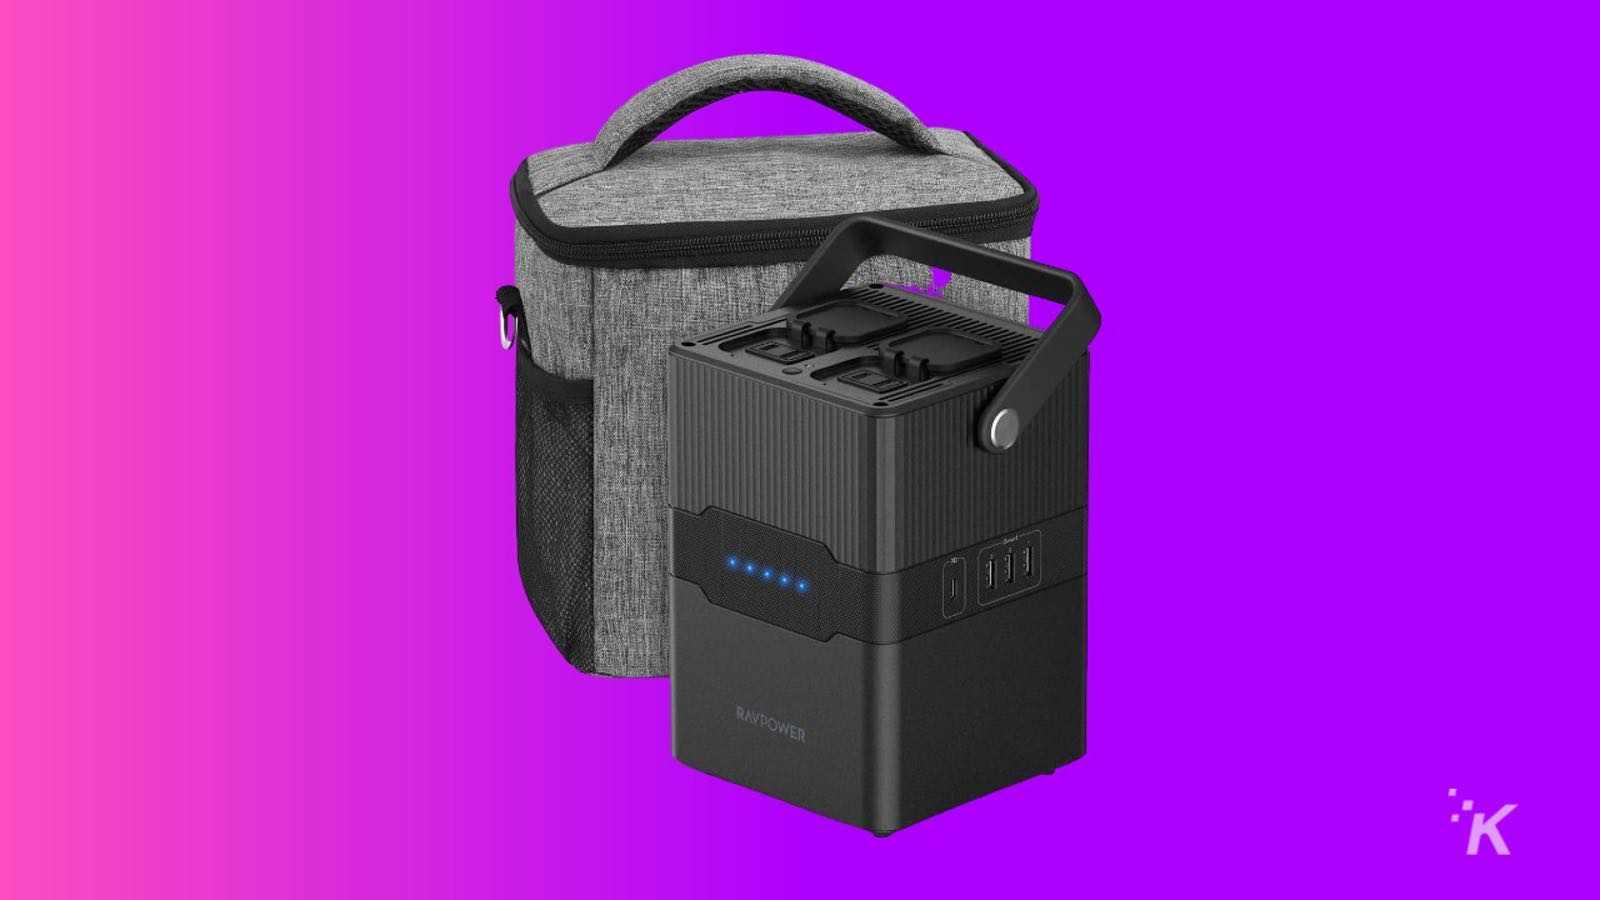 RAVPower portable charging station